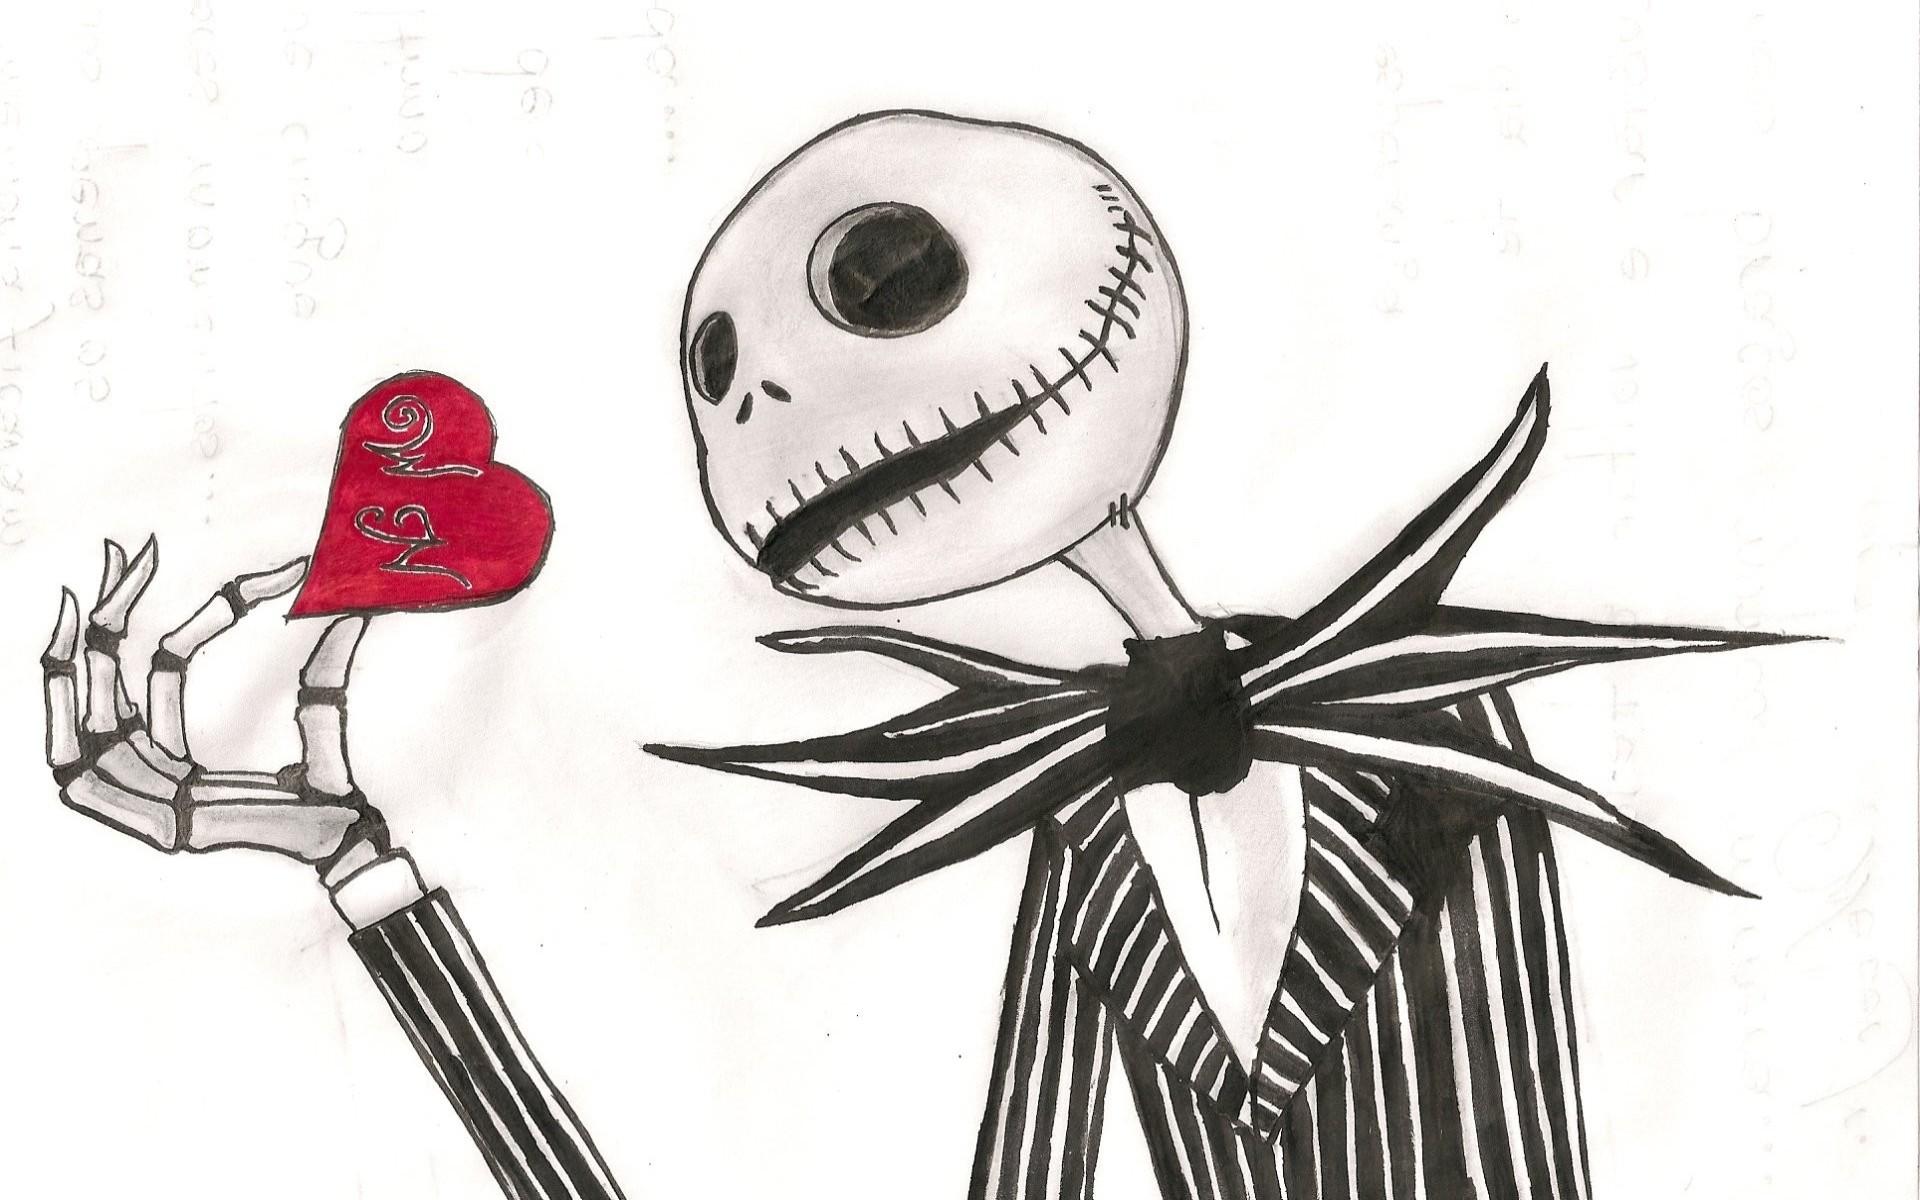 Jack skellington the nightmare before christmas dark skull love romance  mood art wallpaper     28354   WallpaperUP